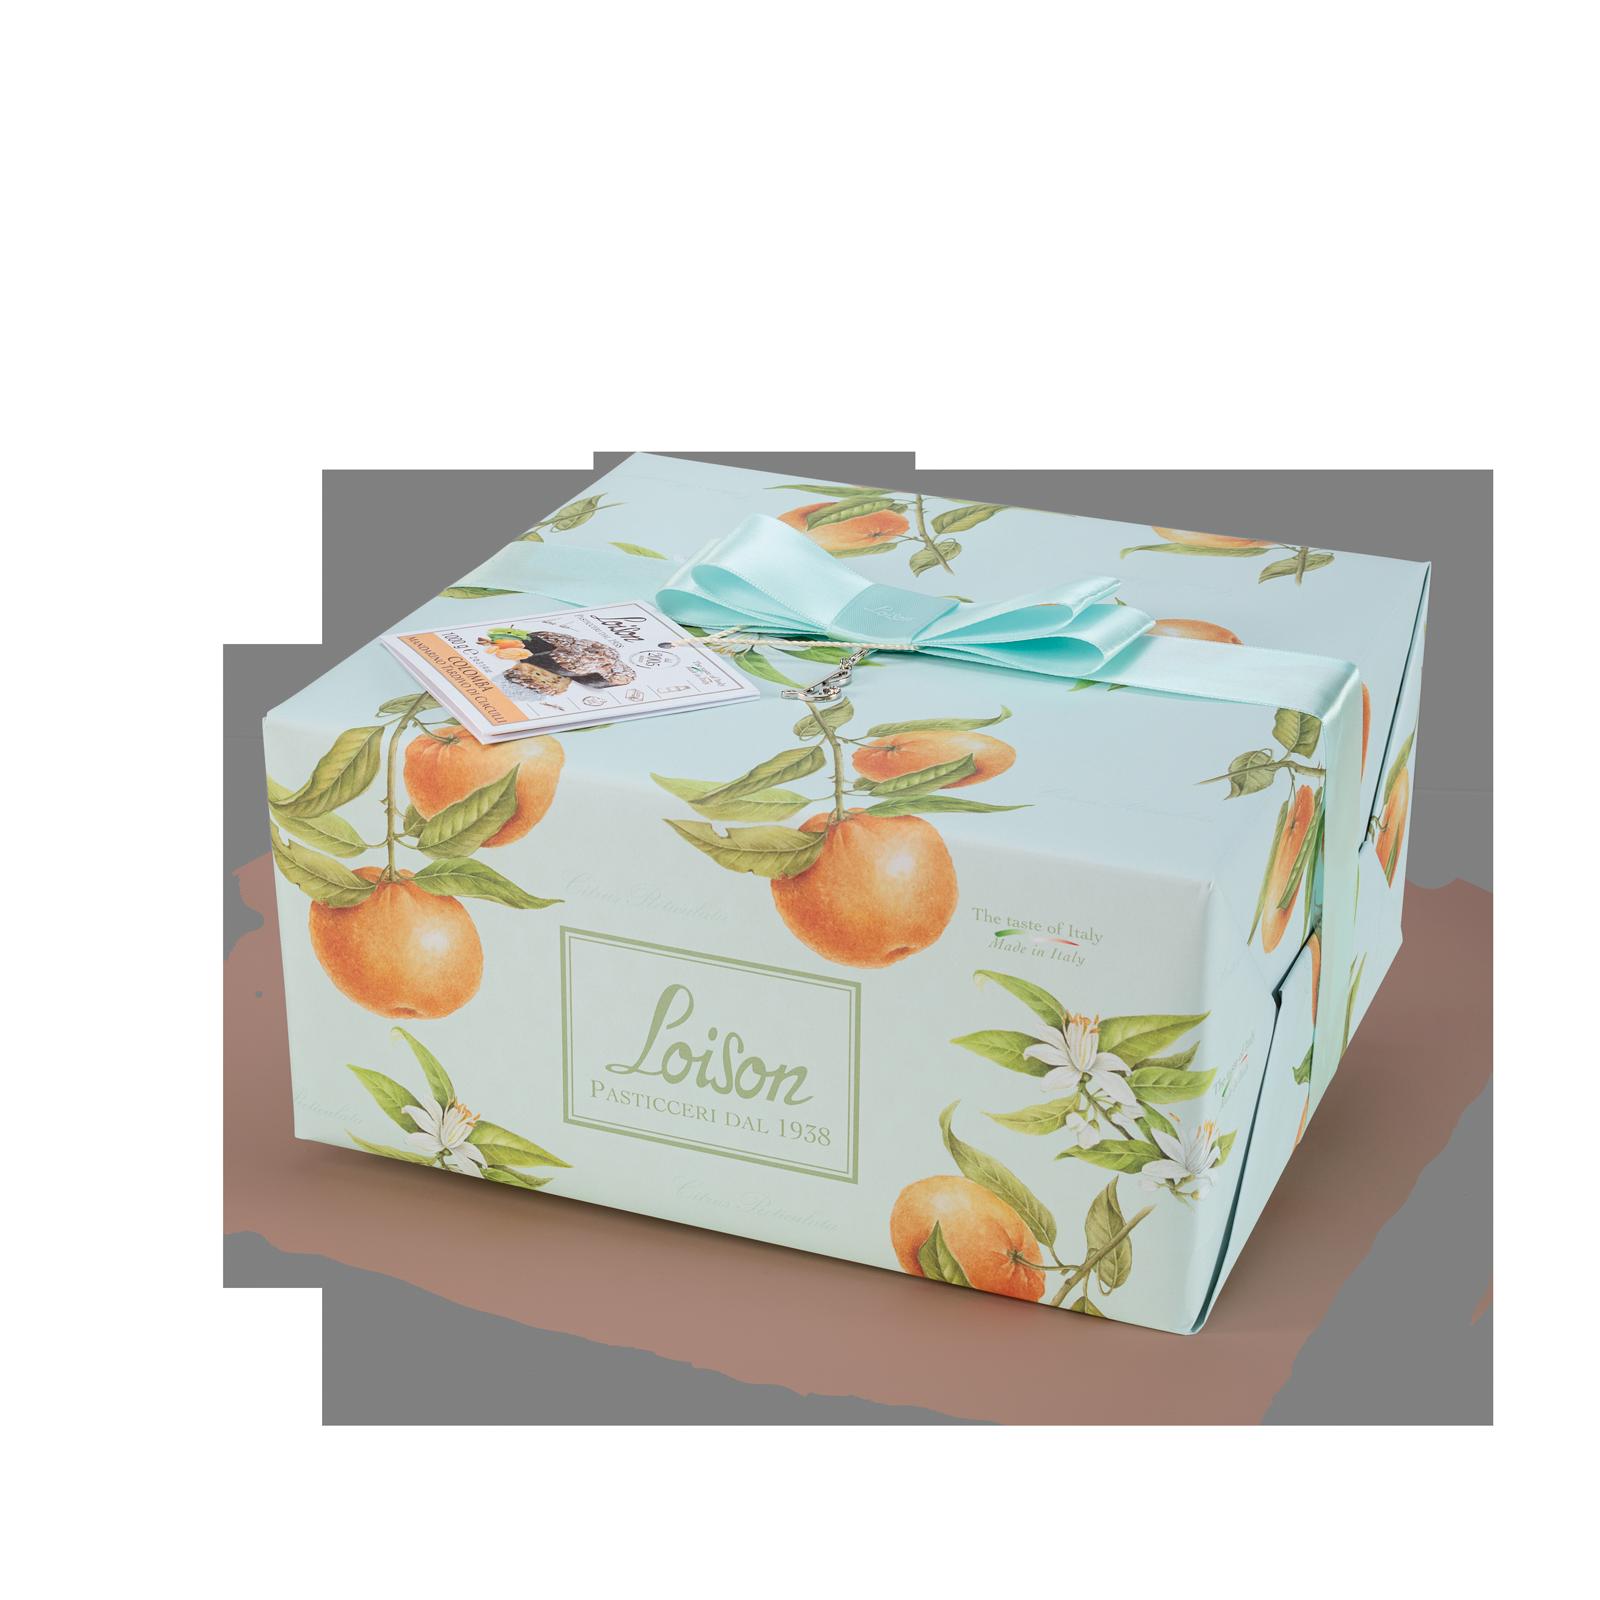 Colomba artigianale mandarino